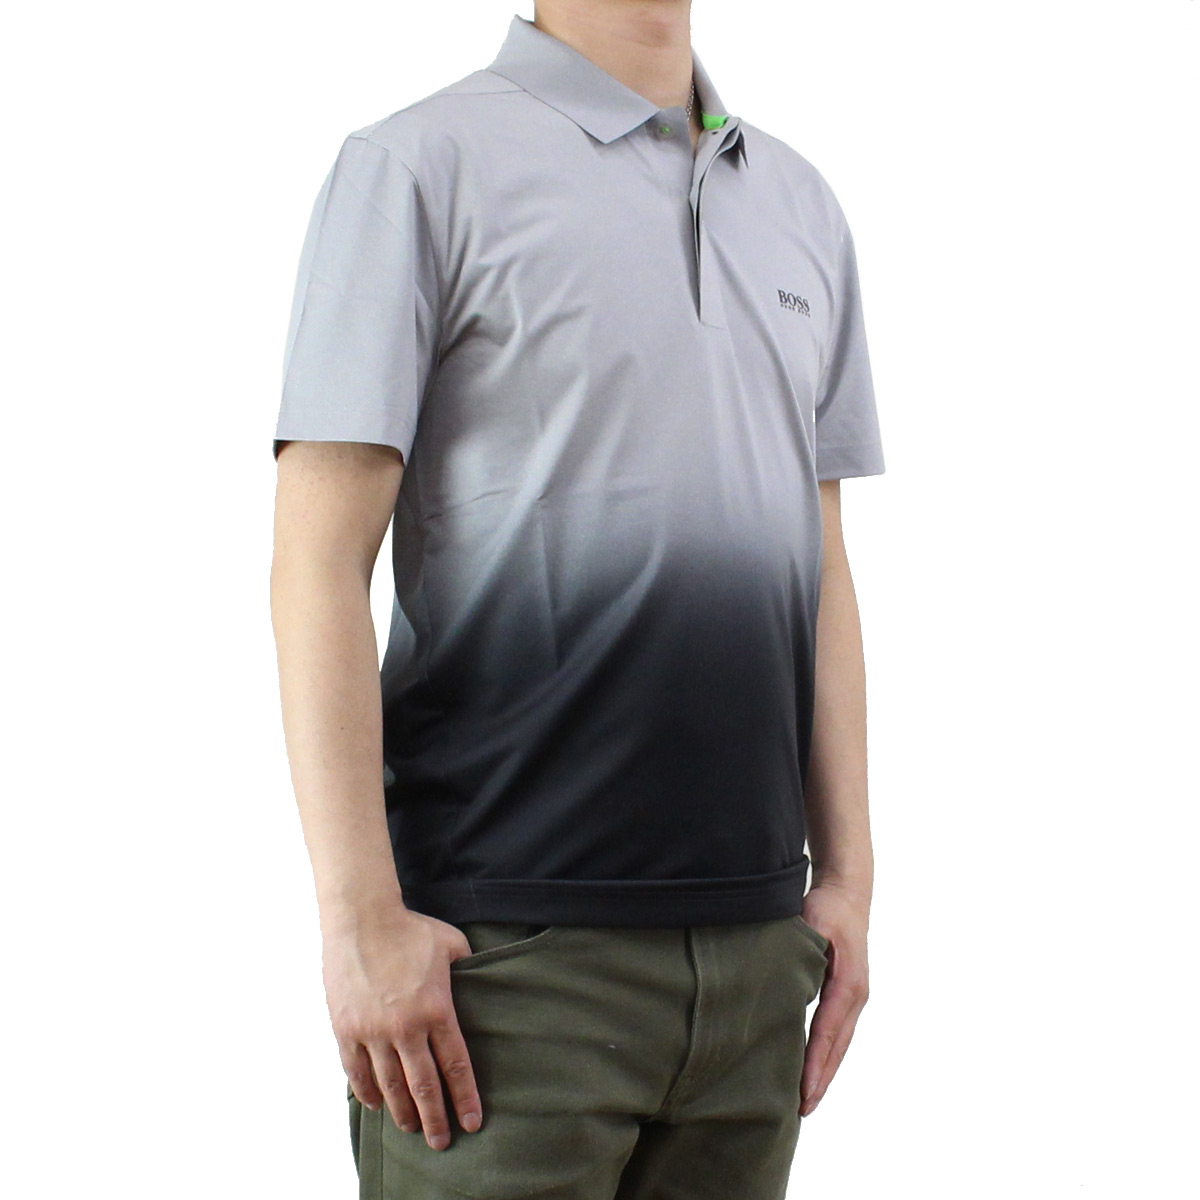 0aeae9ad3 Bighit The total brand wholesale: Hugo boss (HUGO BOSS) PLYOTECH men polo  shirt gradation 50332099 10197607 058 gray system, black | Rakuten Global  Market